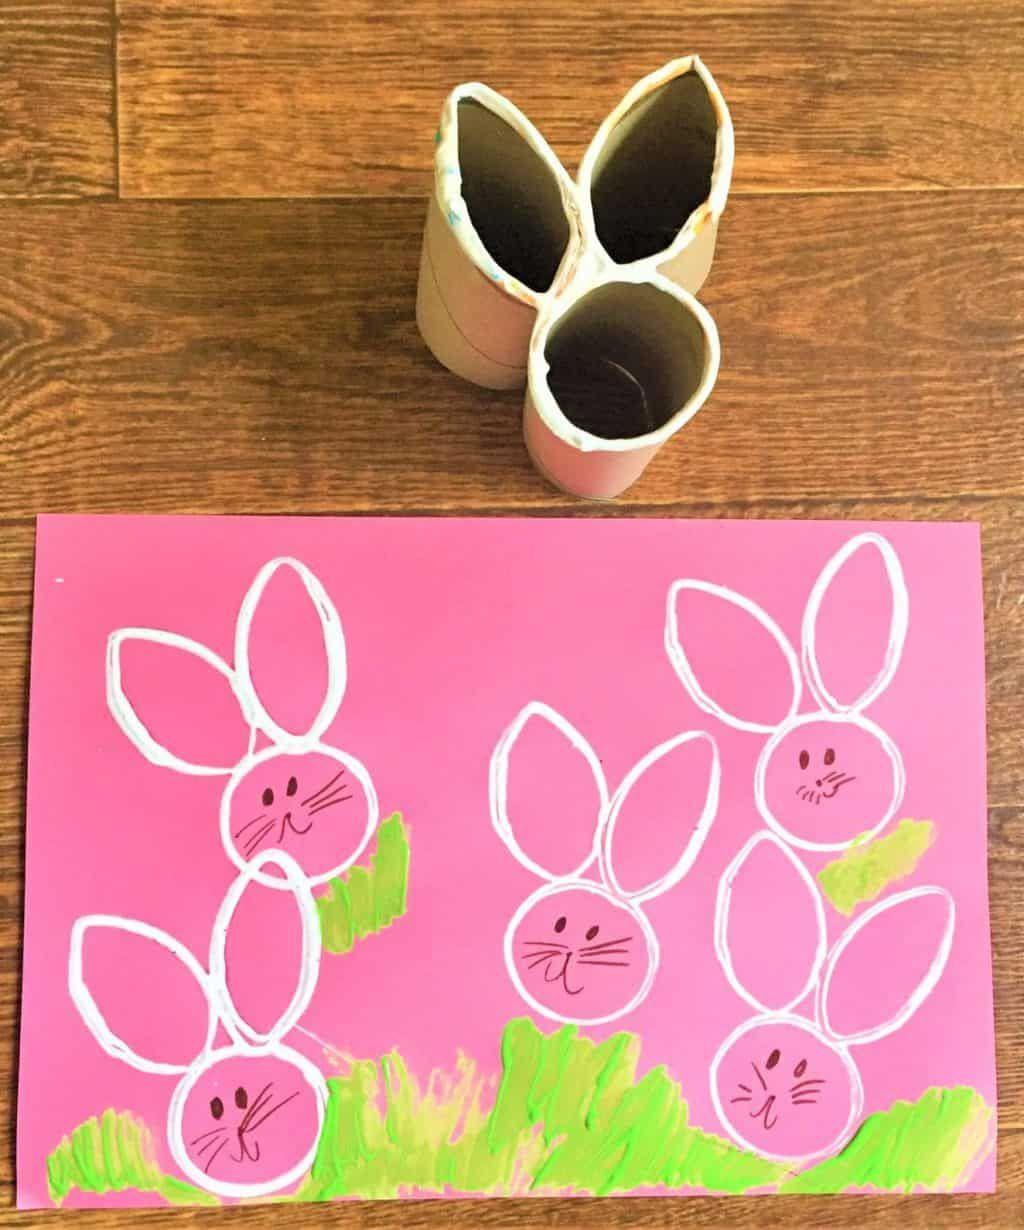 32 Easter Bunny Crafts for Kids   Bunny crafts, Easy easter crafts ...